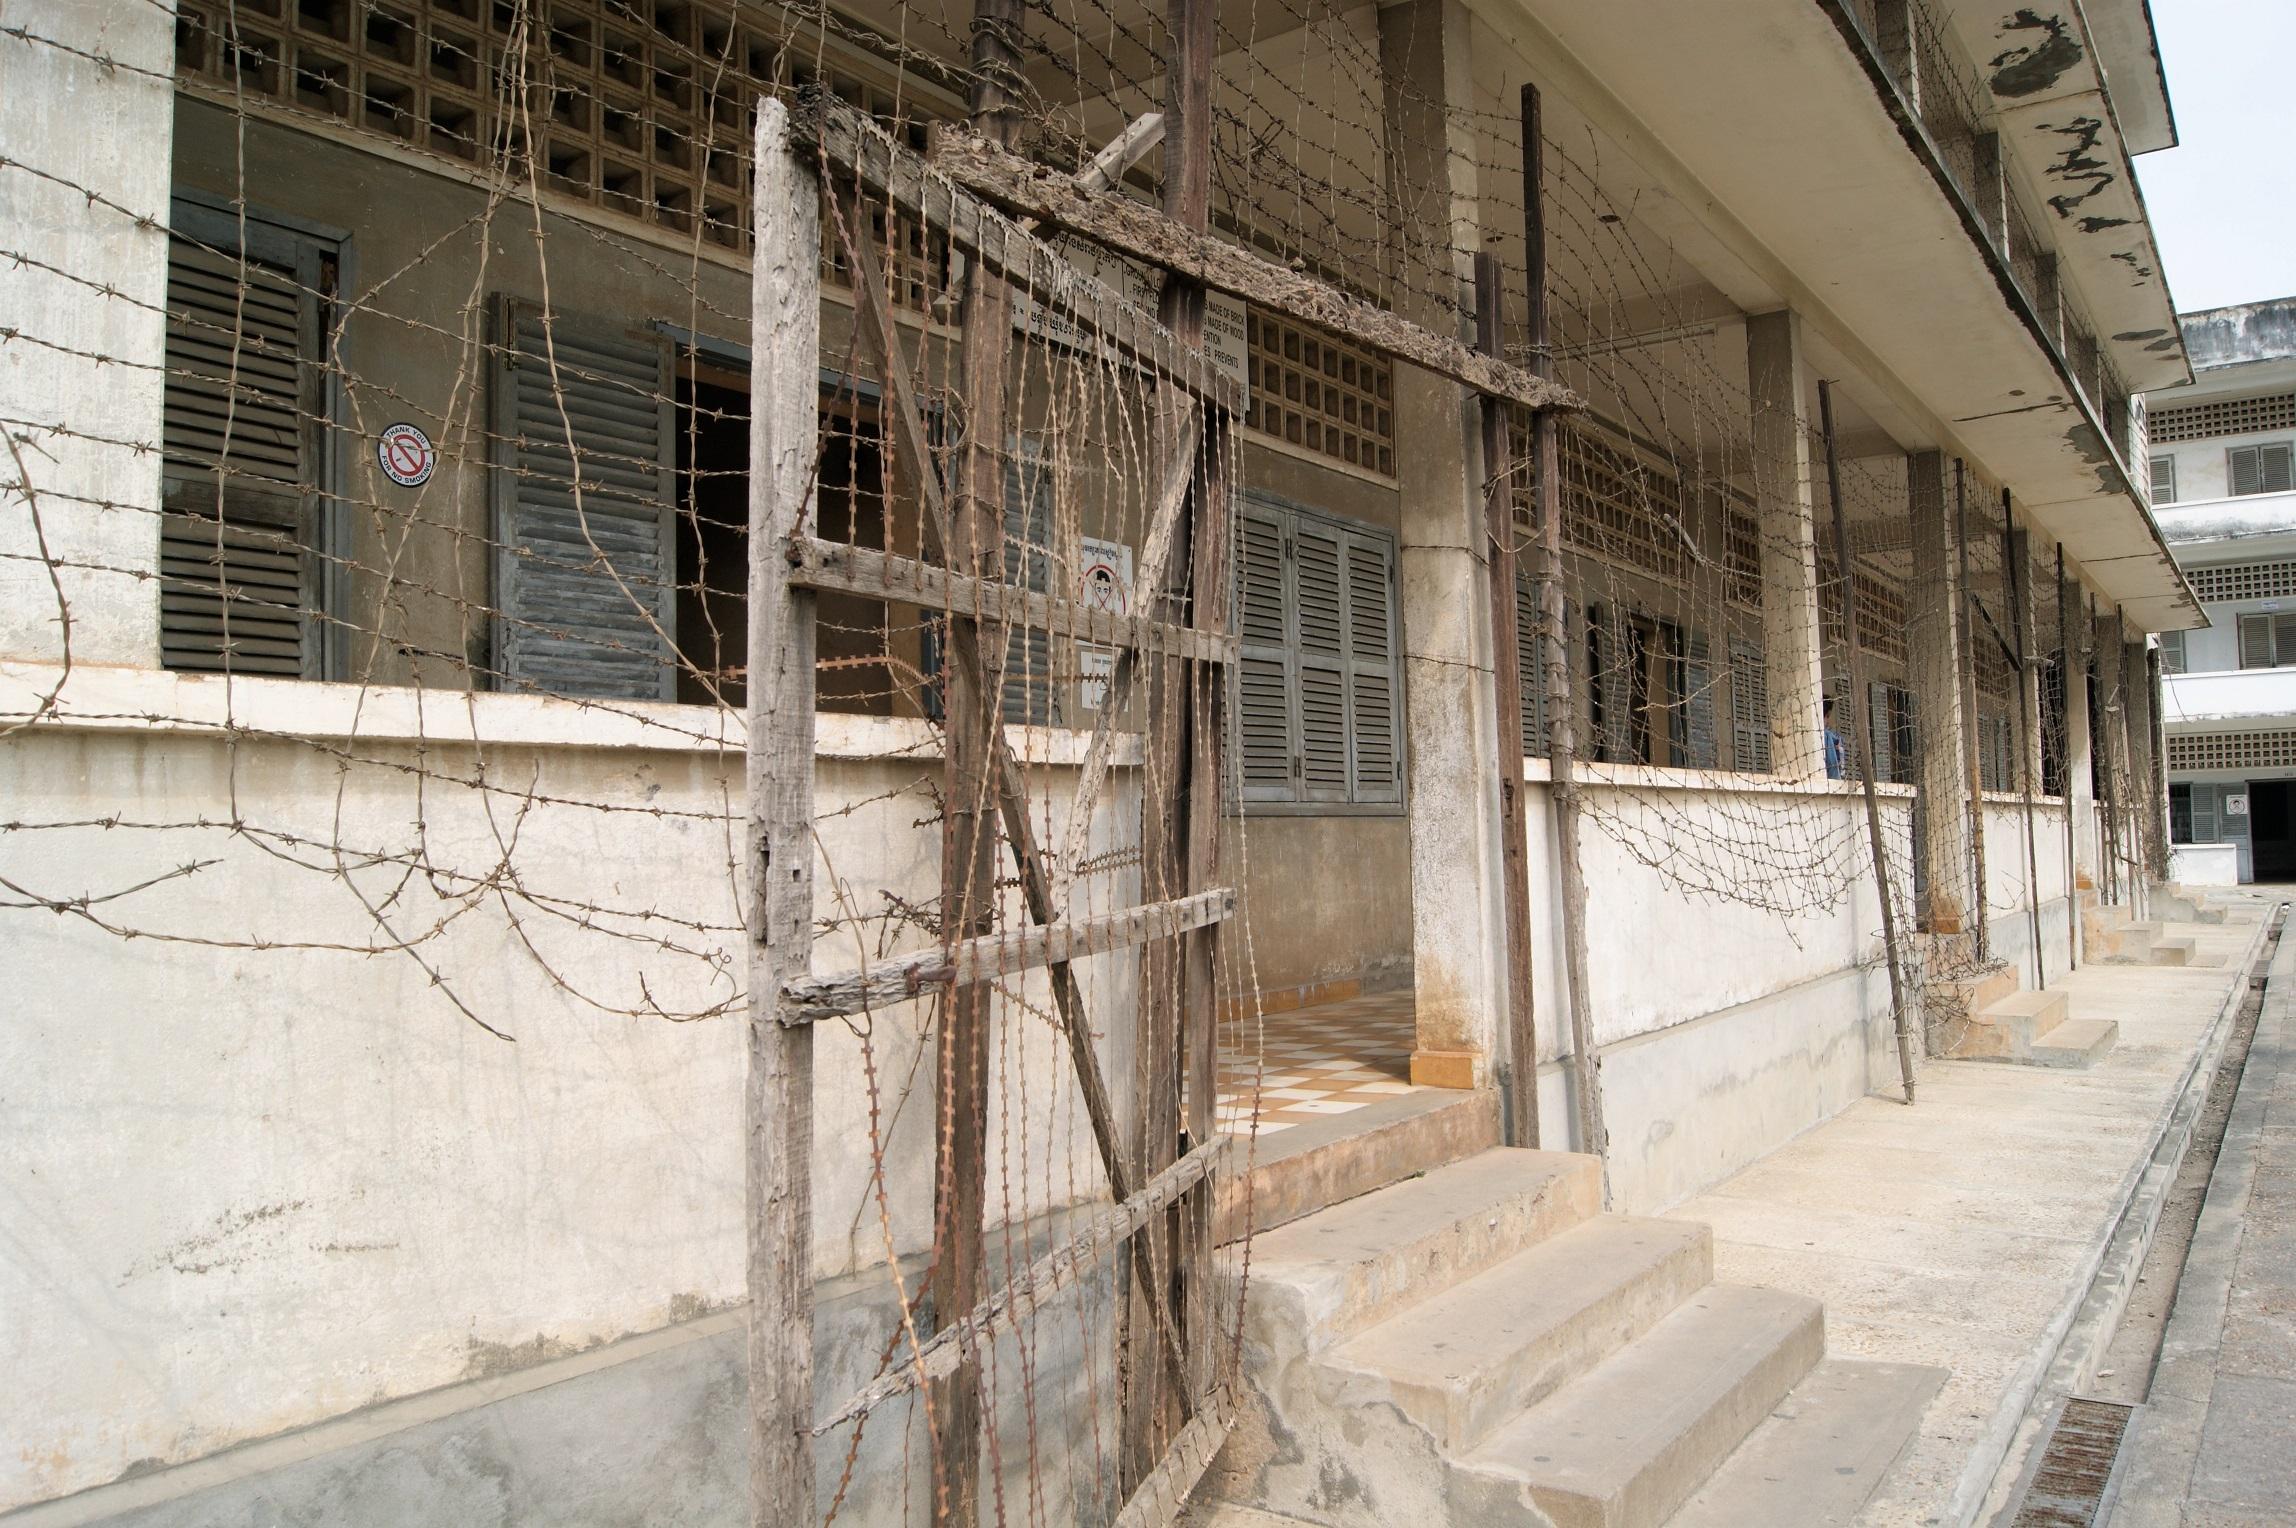 S-21, or Tuol Sleng prison